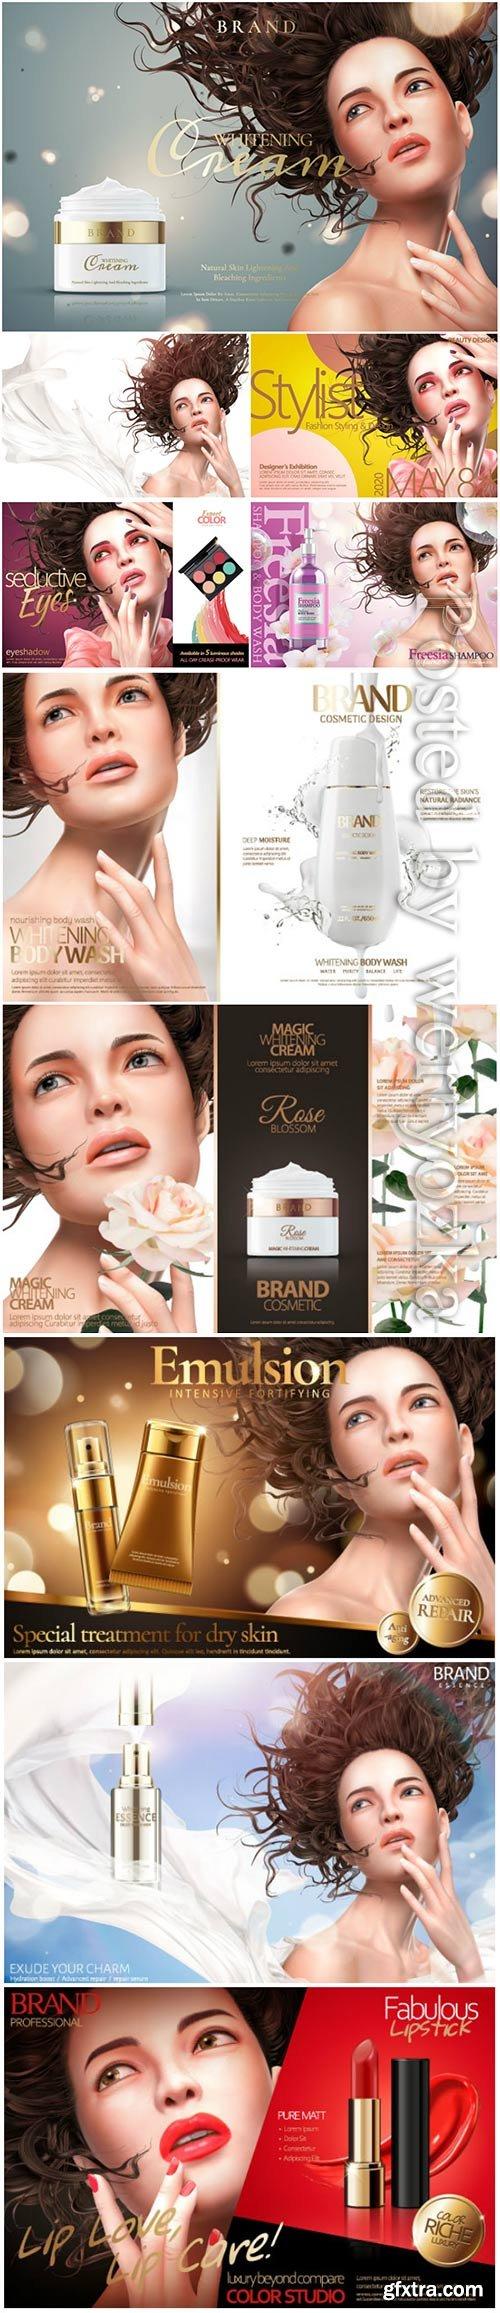 Cosmetics advertising posters, beautiful girl